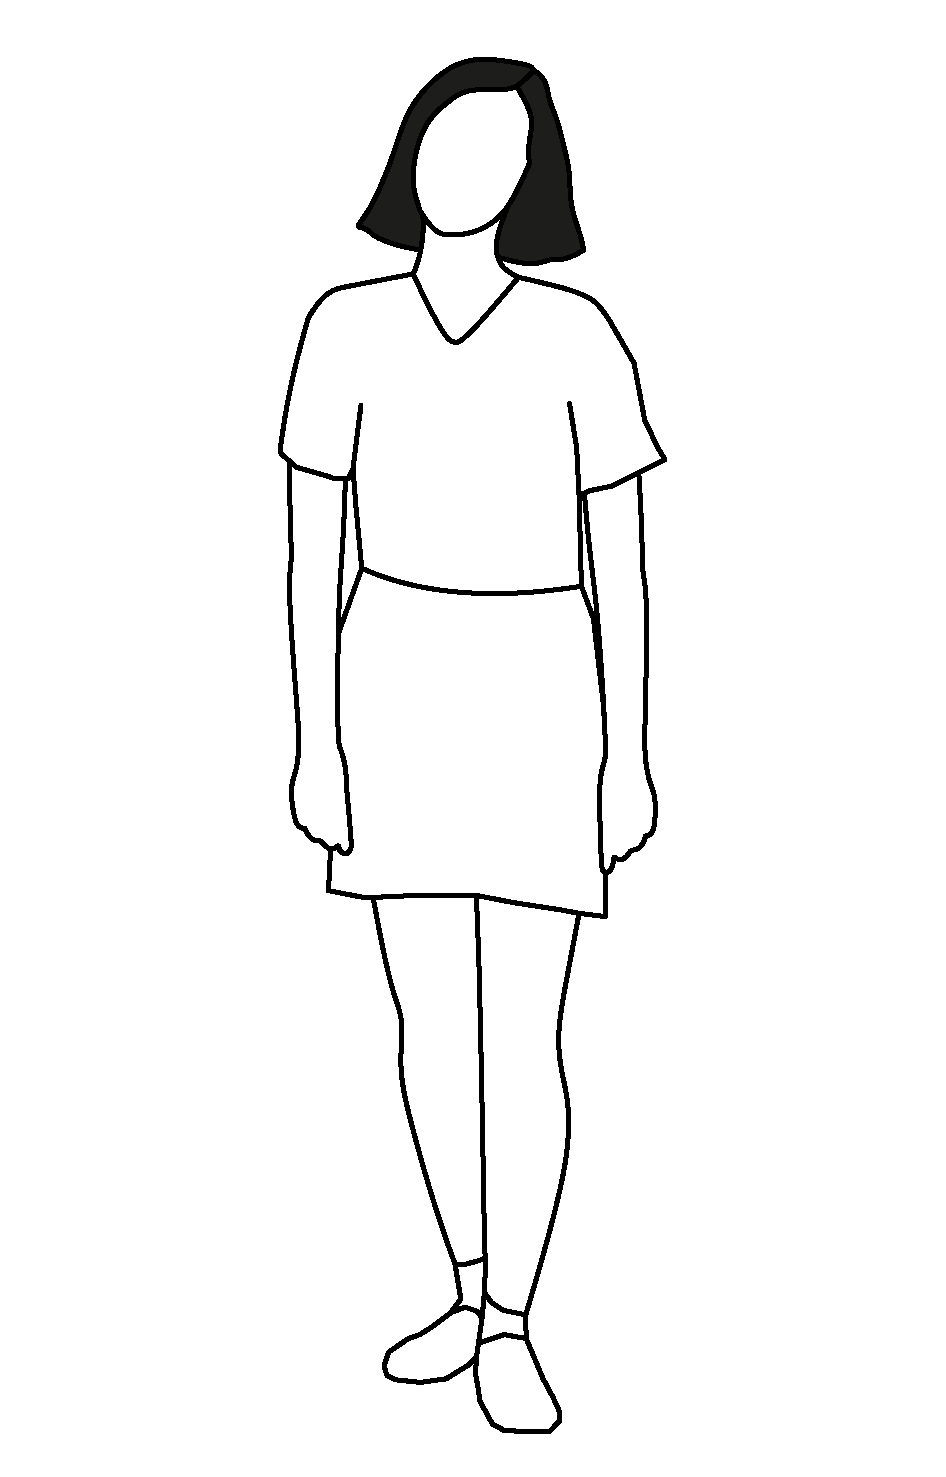 210910_outline wohnlabor_final-04